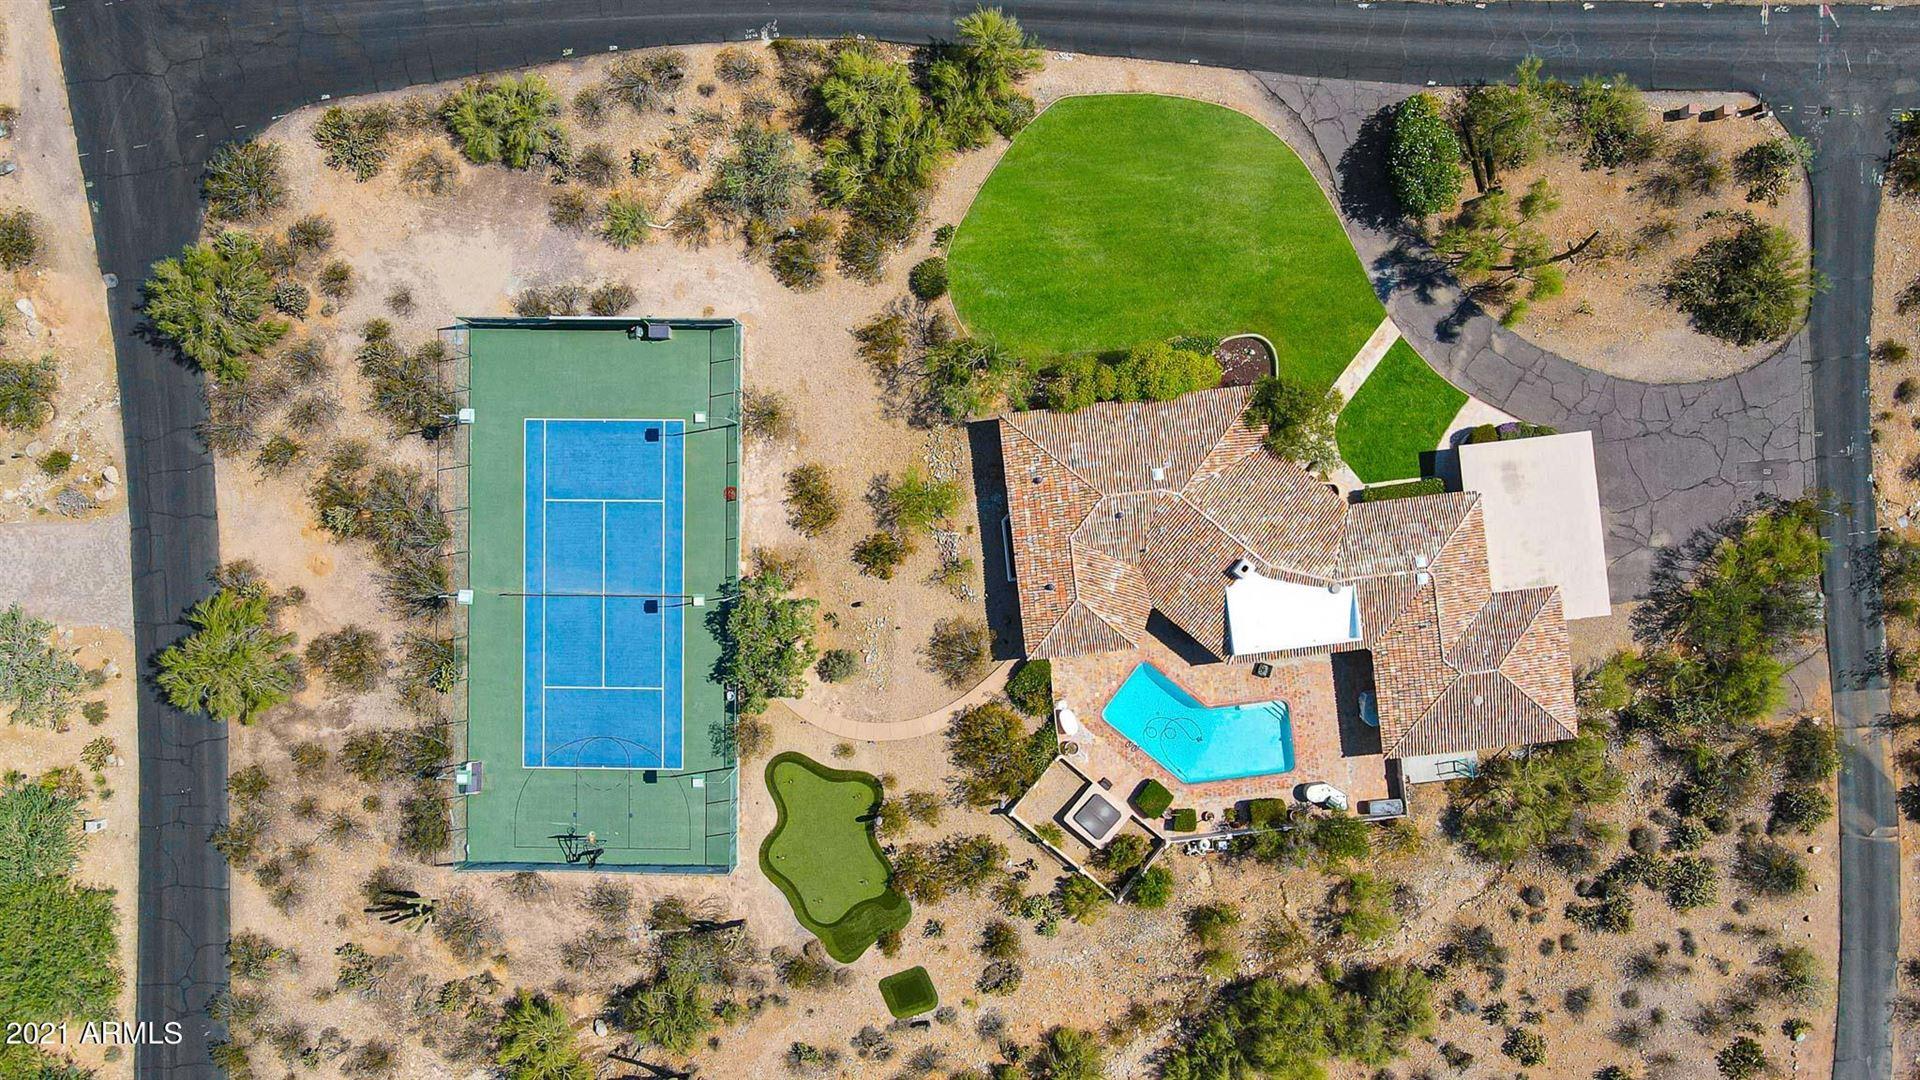 Photo of 6220 E Cholla Drive, Paradise Valley, AZ 85253 (MLS # 6263986)